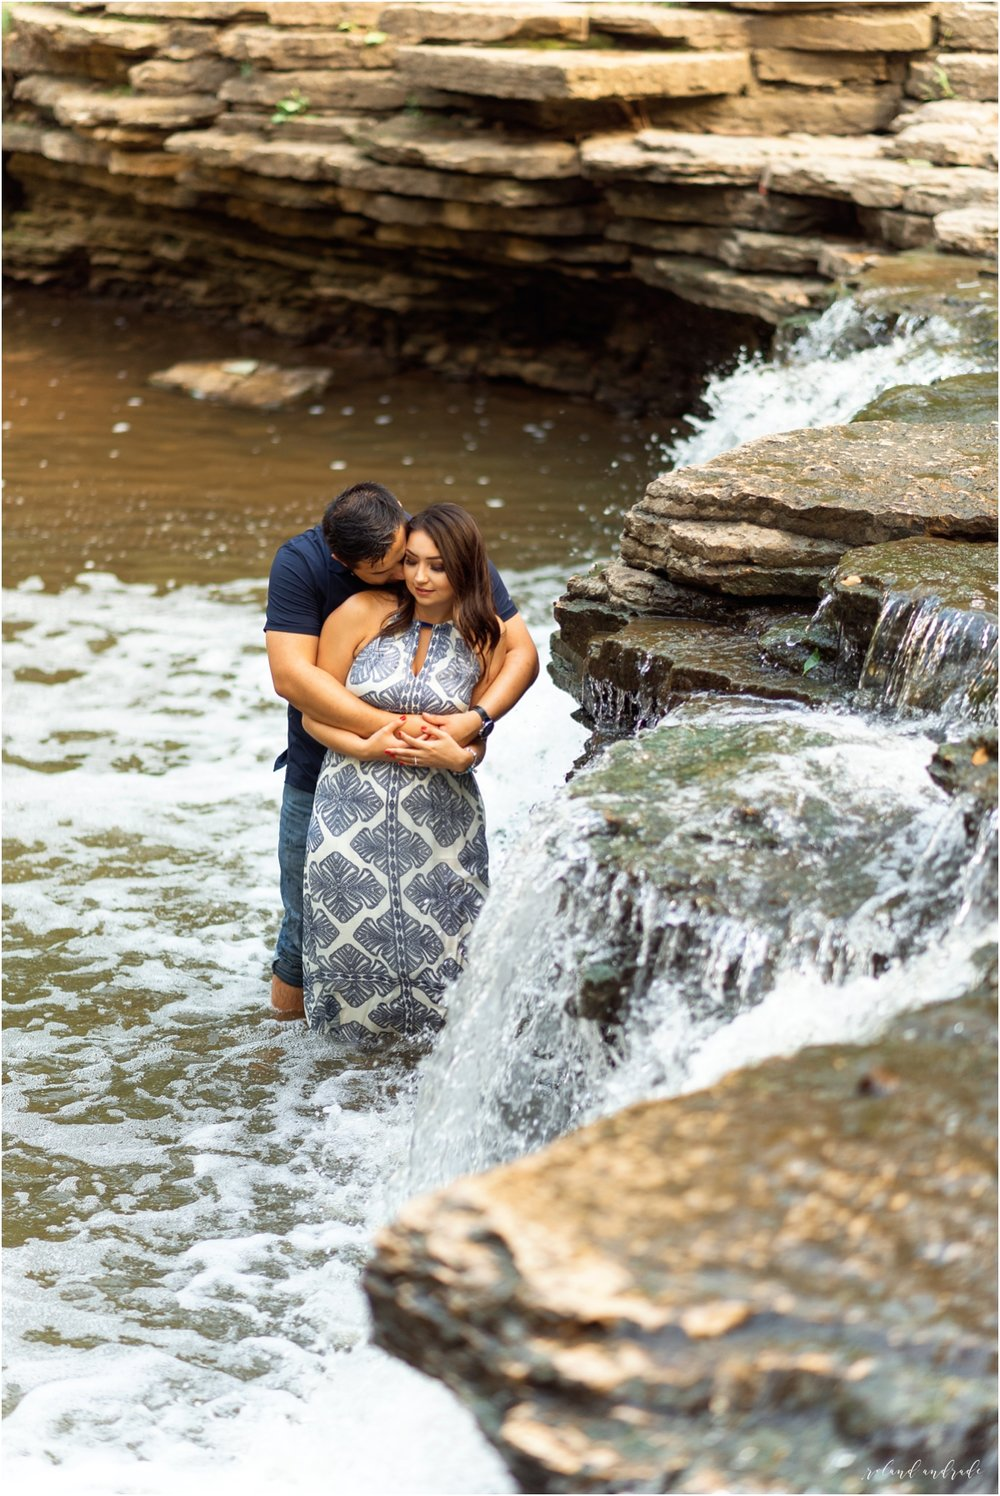 Waterfall Glenn Engagement Session, Lemont Illinois Engagement Session, Chicago Wedding Photographer, Naperville Wedding Photographer, Aurora Wedding Photographer40.jpg